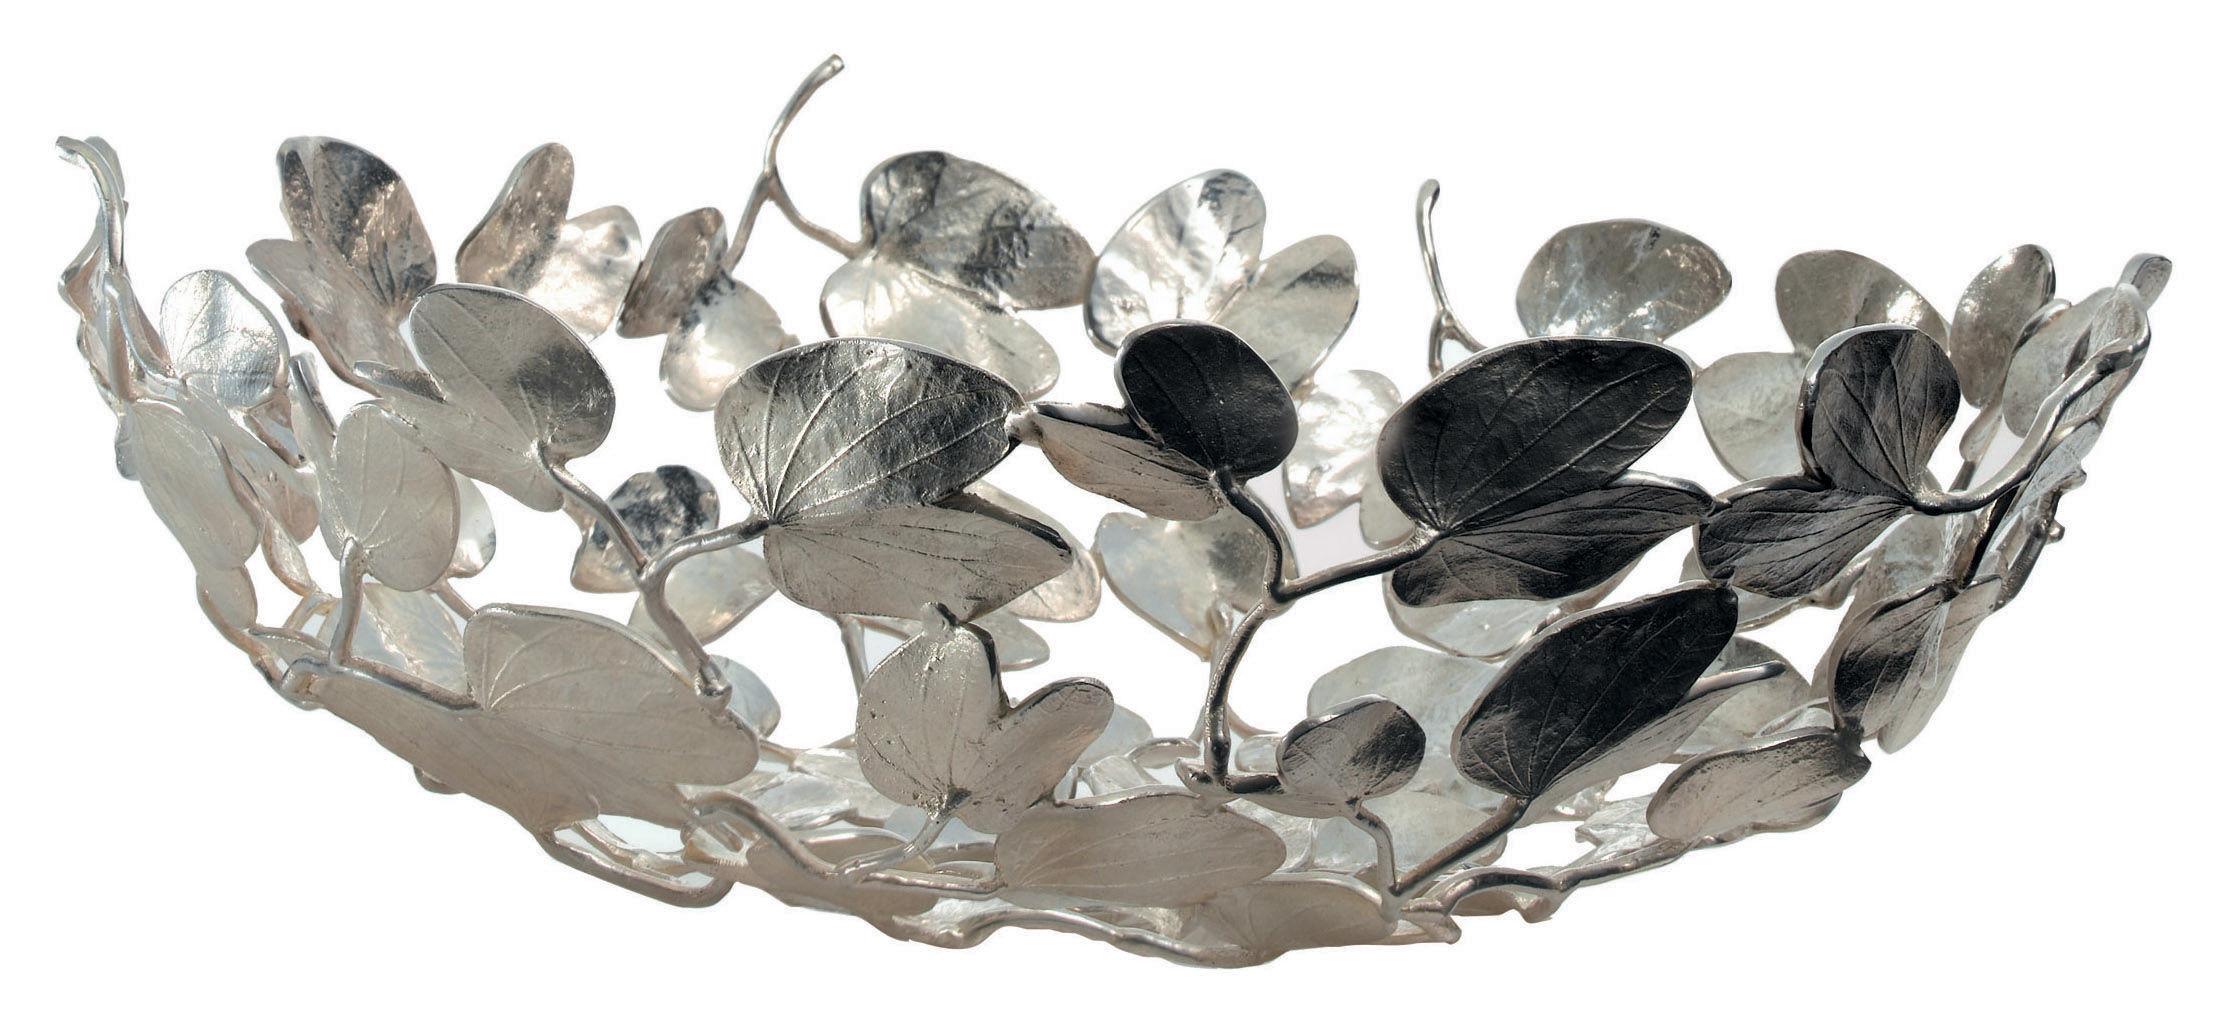 Tischkultur - Körbe, Fruchtkörbe und Tischgestecke - Kachnar II Korb Blättermotiv - Driade Kosmo - Messing versilbert - versilbertes Messing